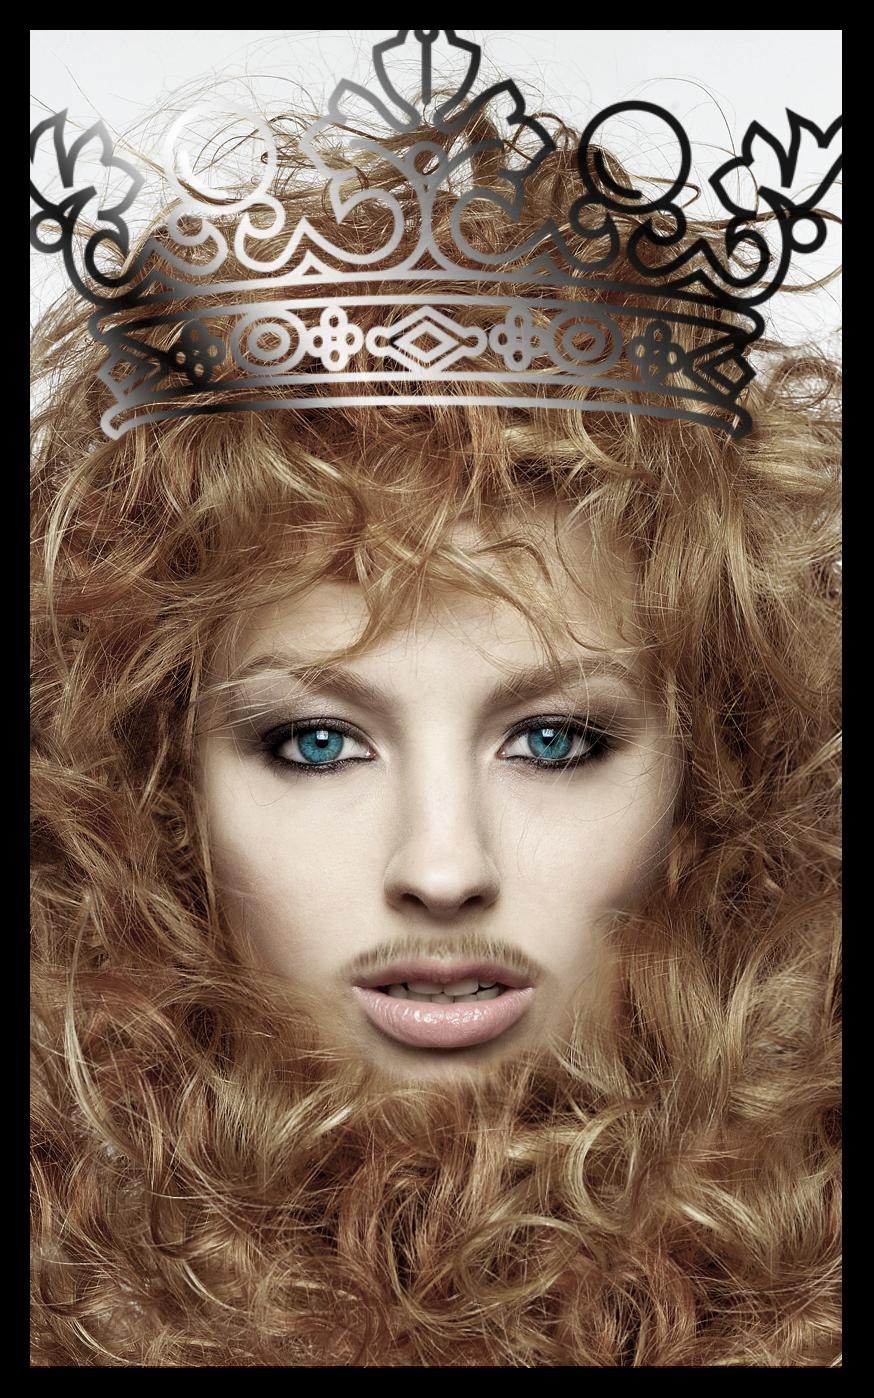 <b>LION QUEEN</b> by estile <b>LION QUEEN</b> by estile - lion_queen_by_estile